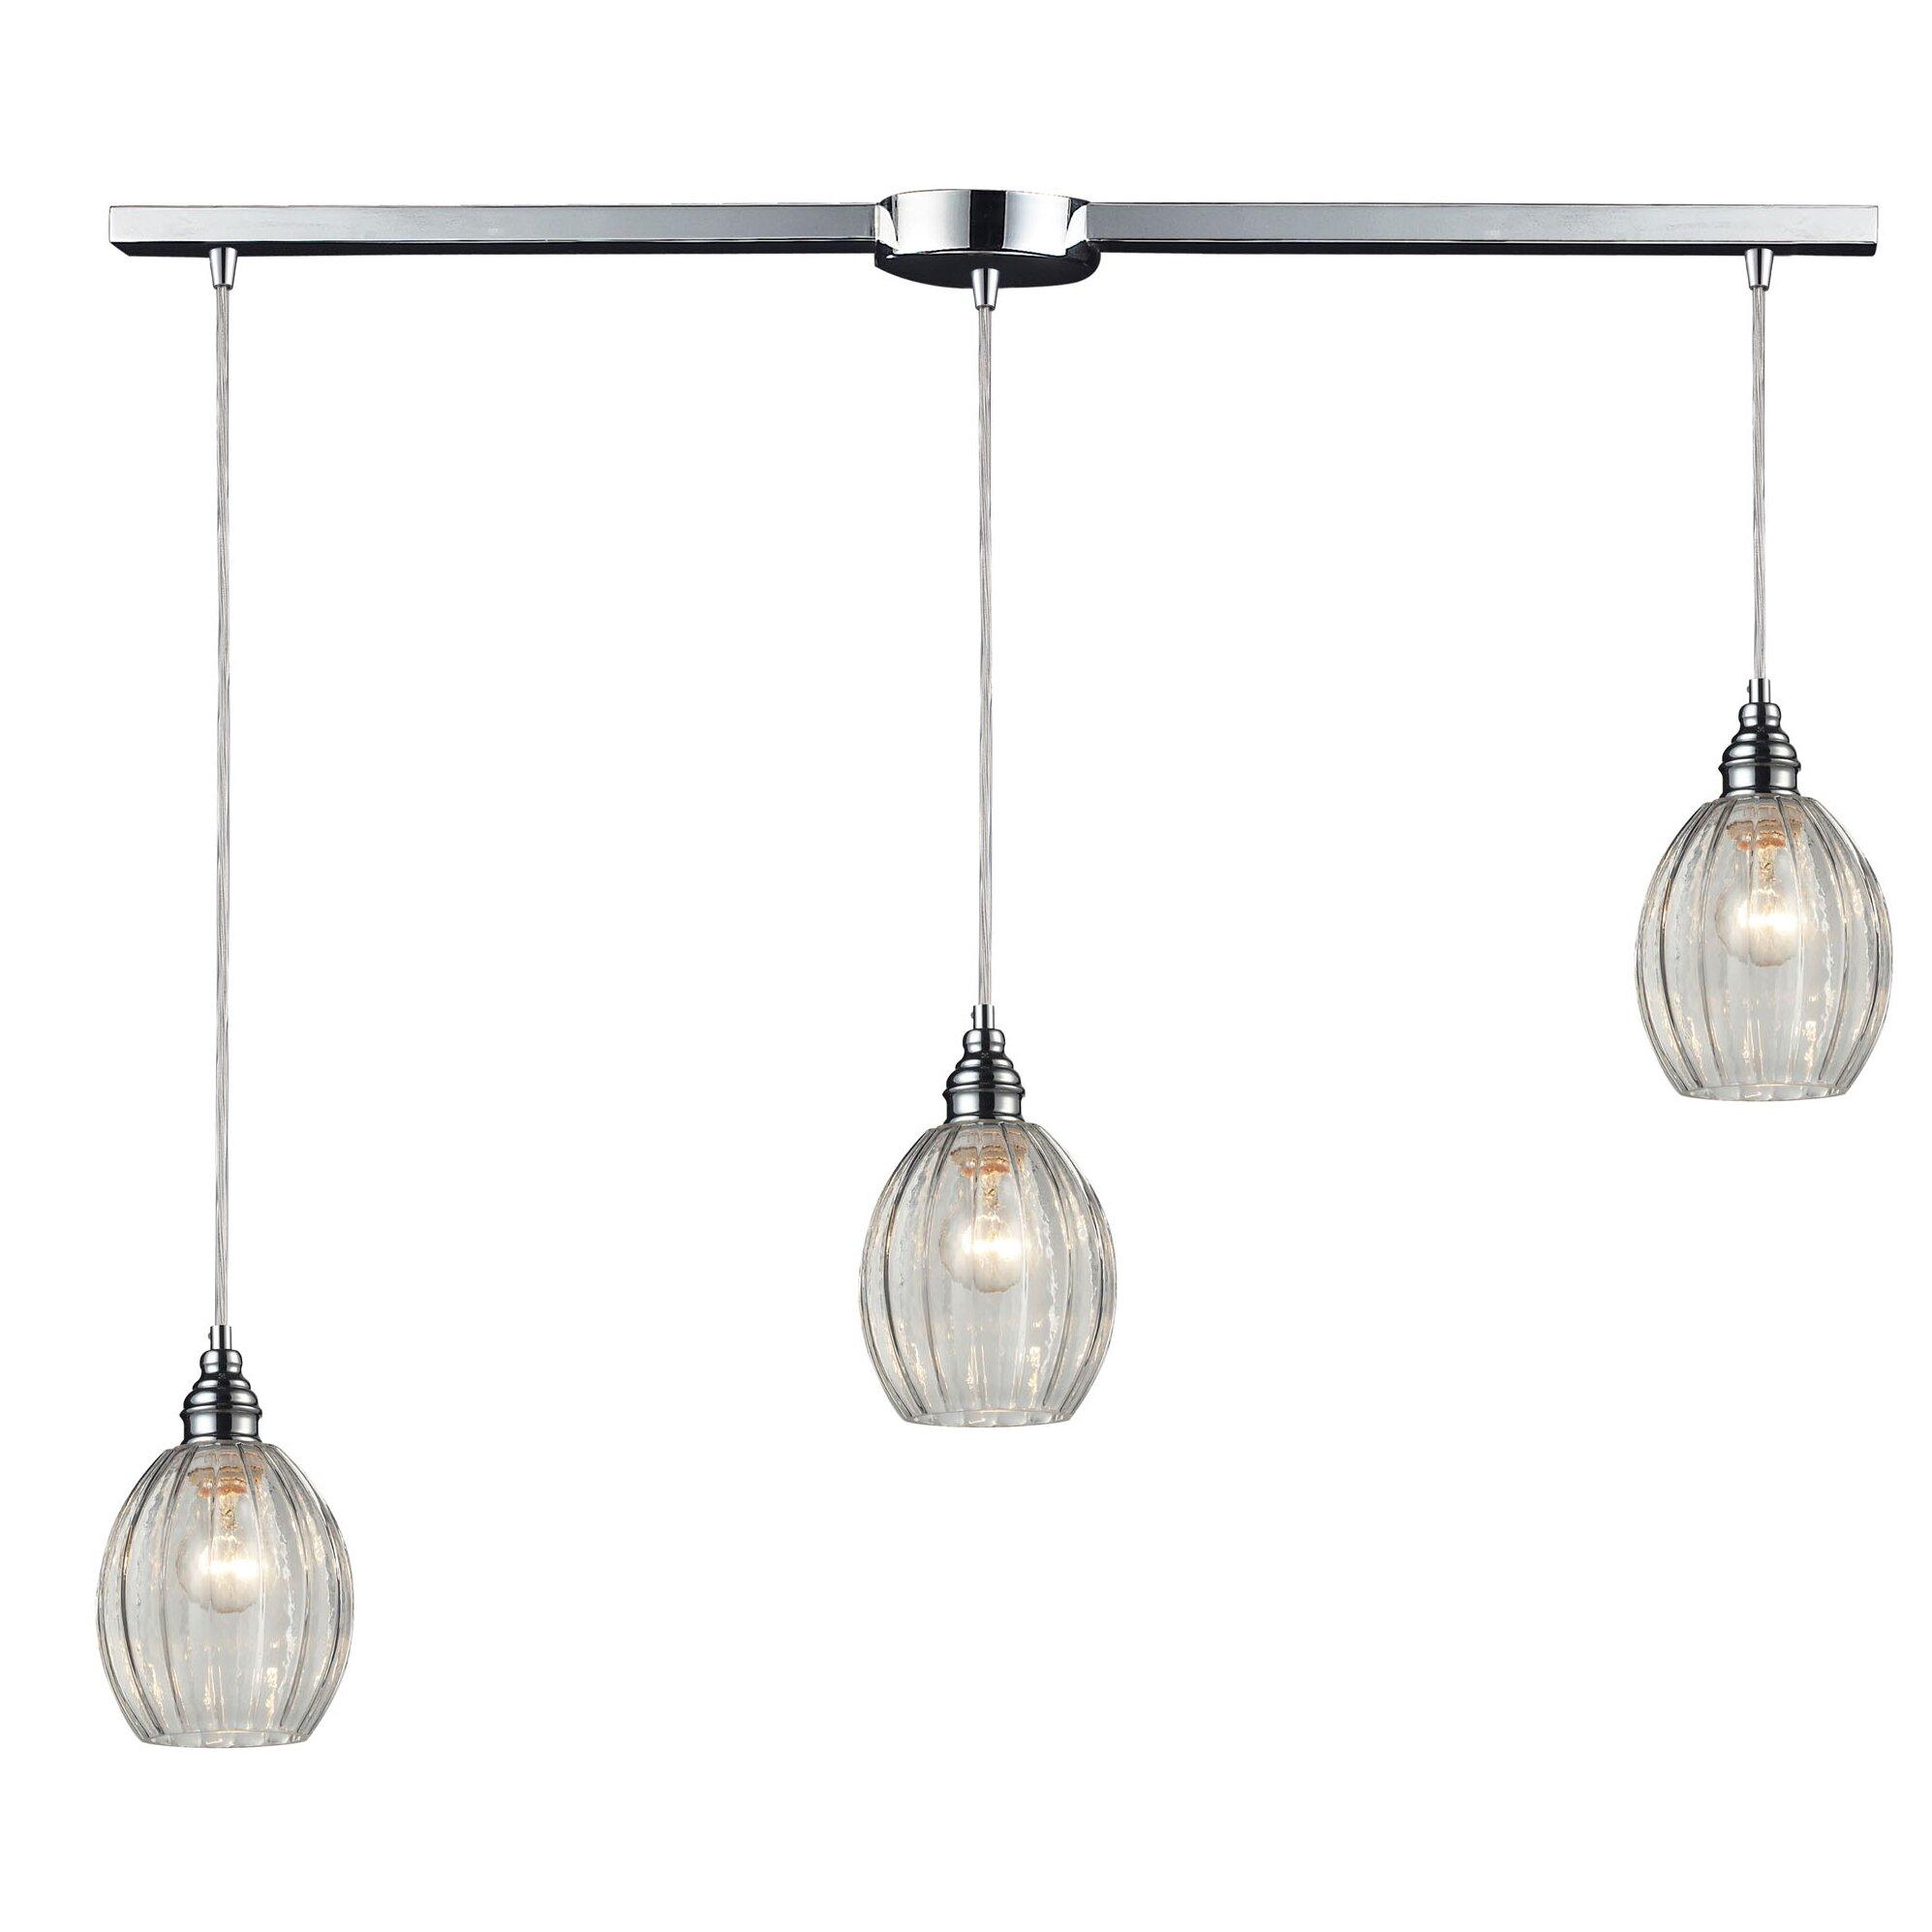 Laurel foundry modern farmhouse orofino 3 light kitchen for Modern kitchen light pendants